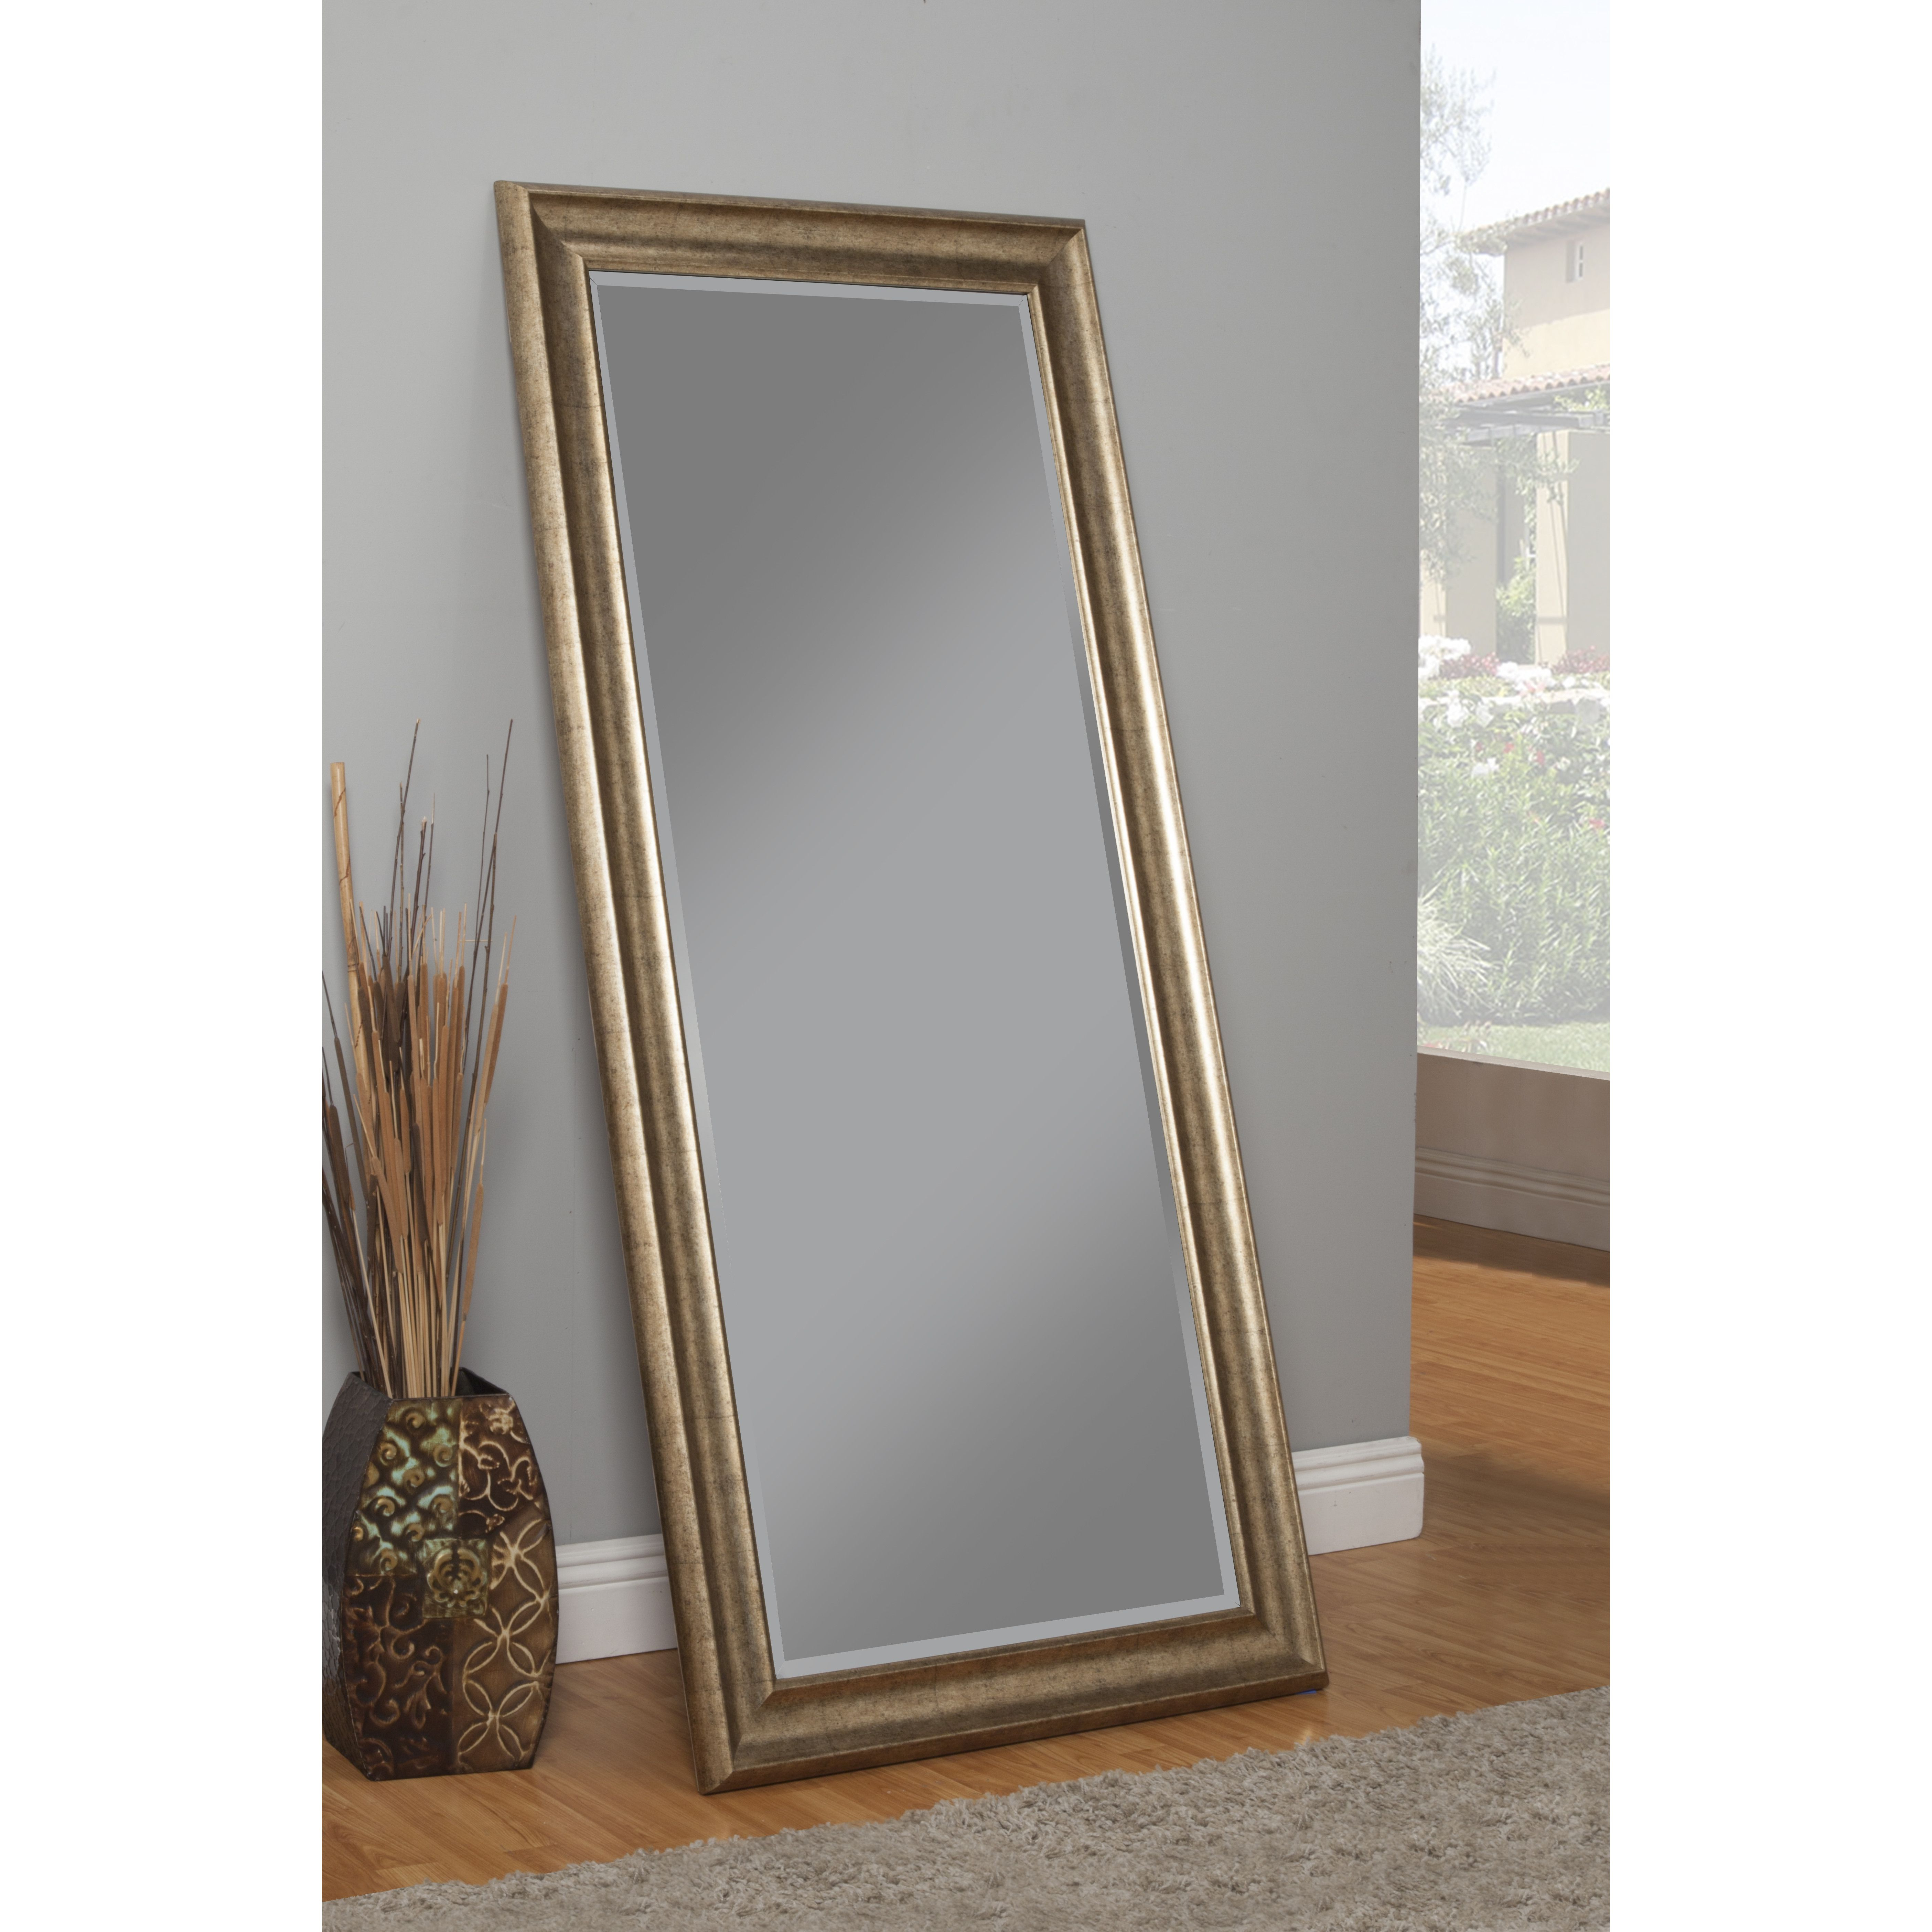 Northcutt Full Length Mirror | Wishlist | Leaner Mirror Regarding Northcutt Accent Mirrors (View 11 of 30)